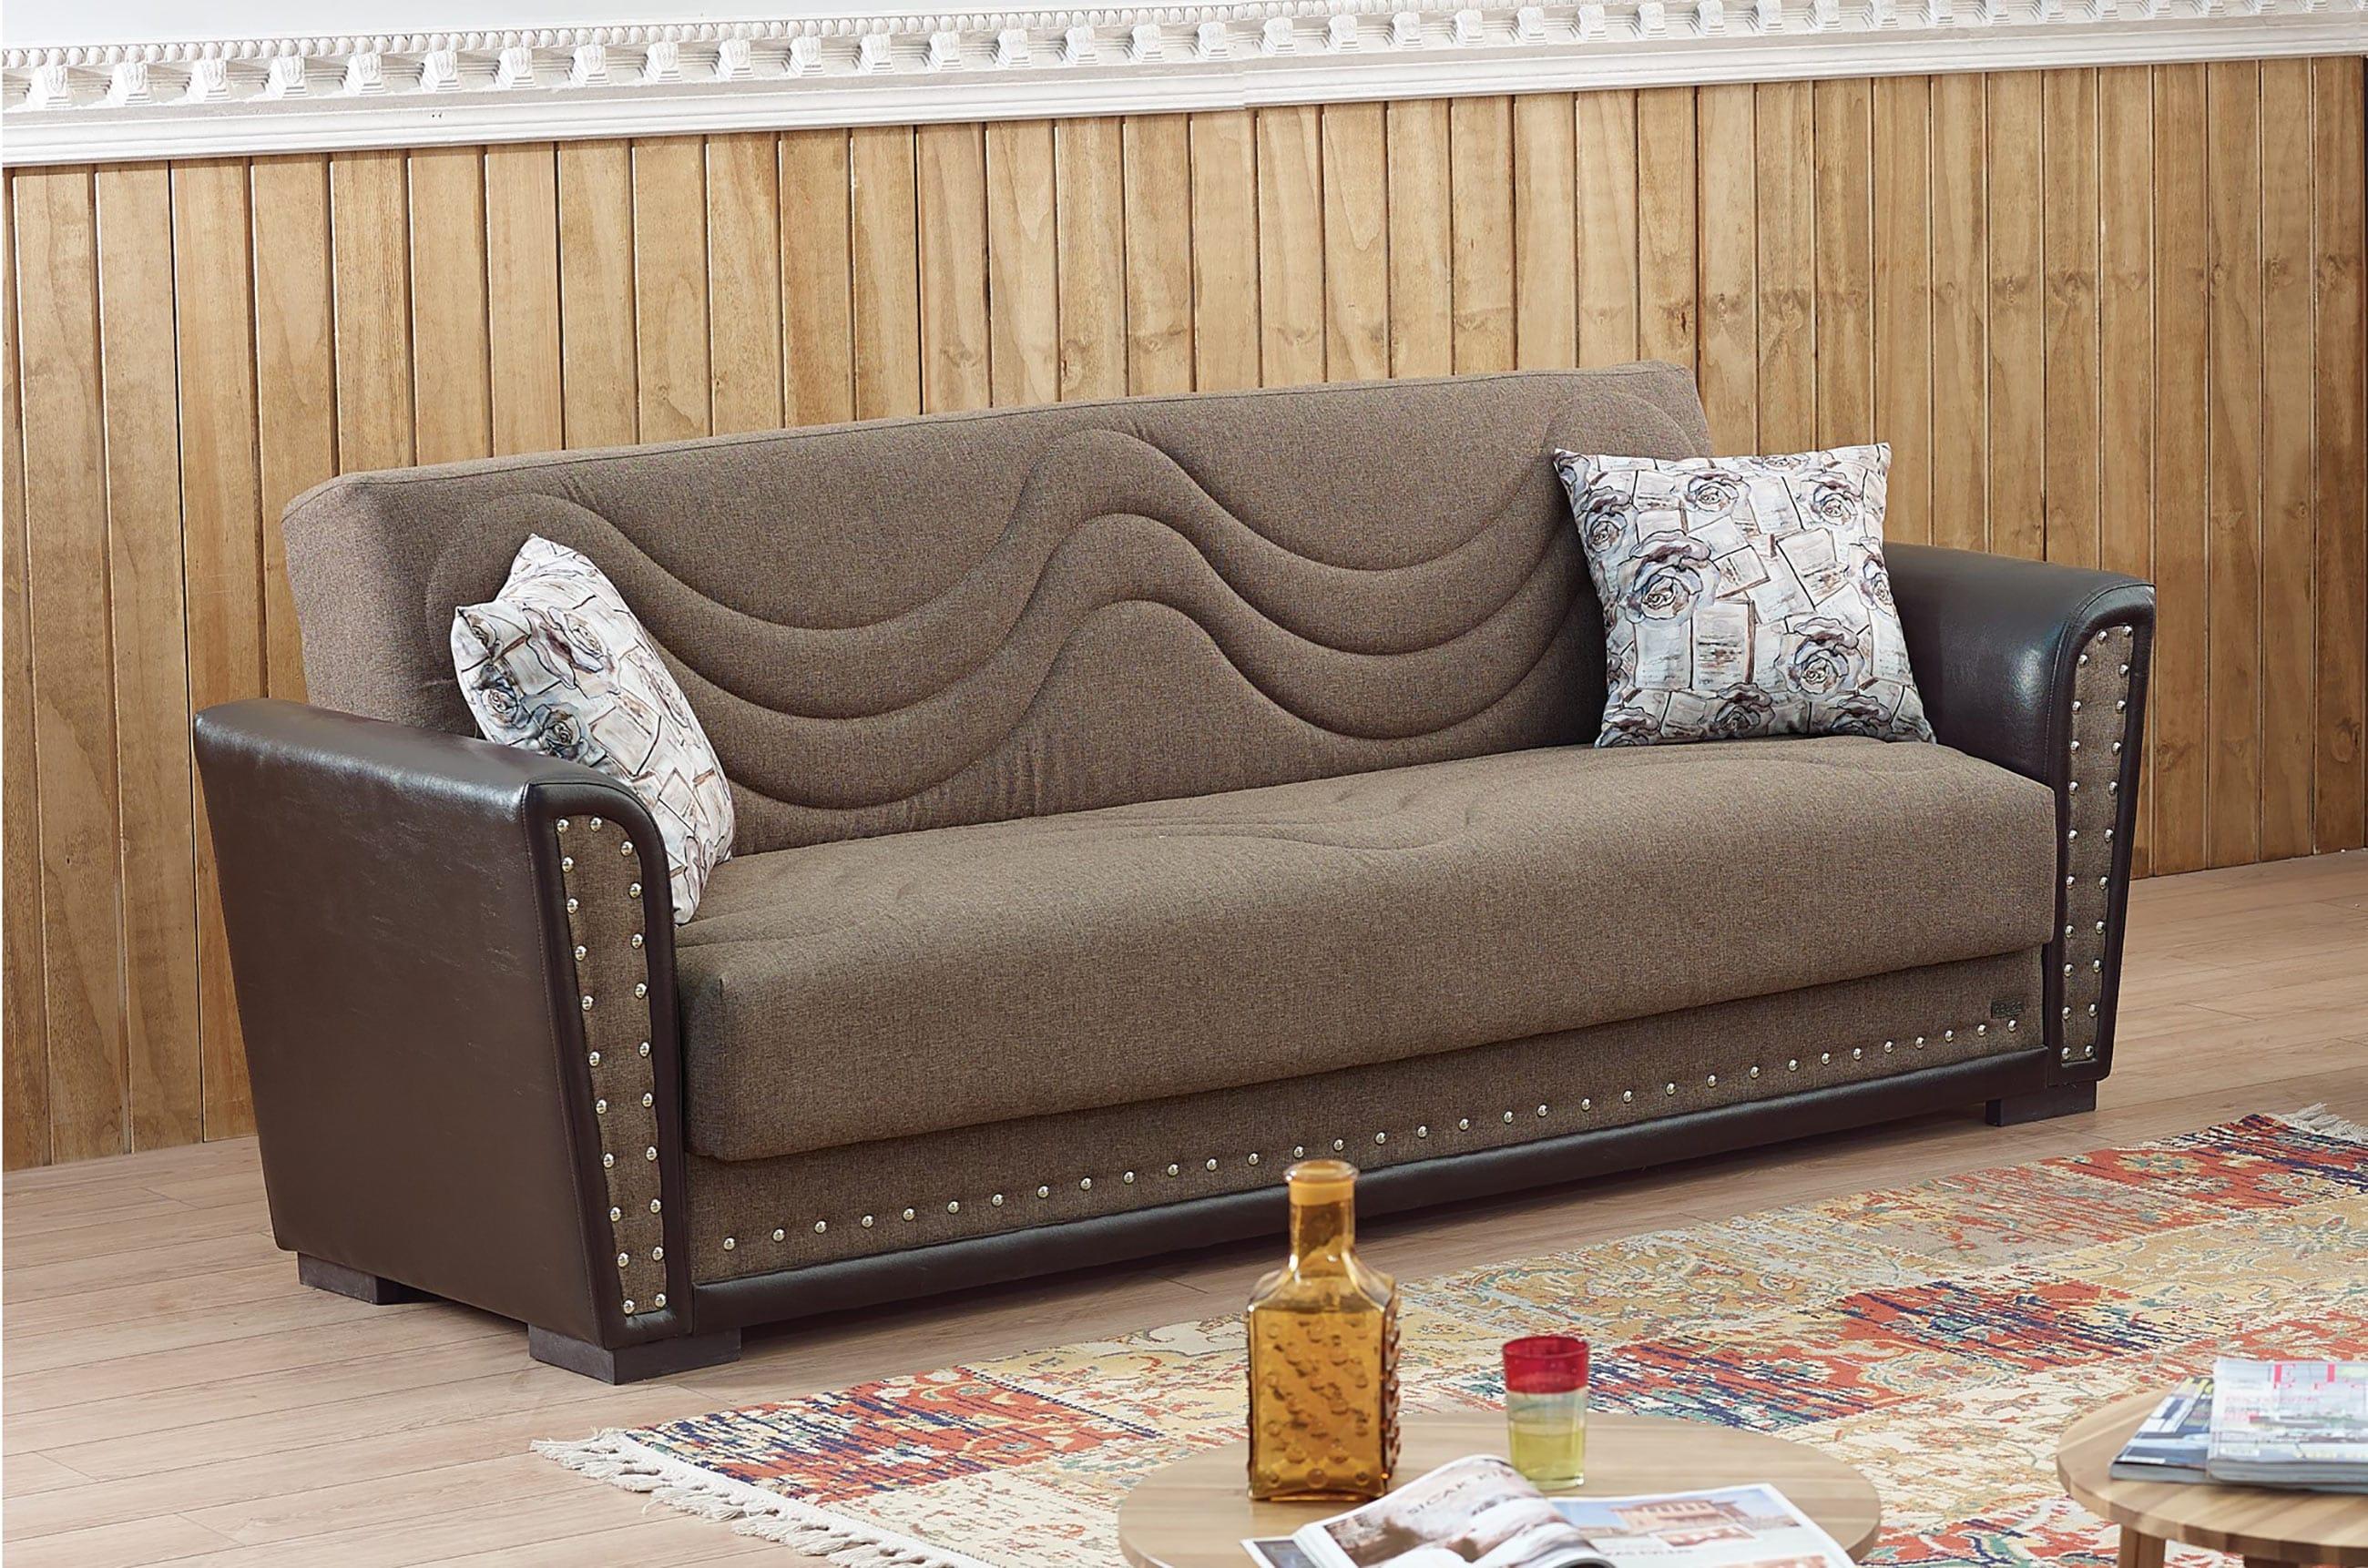 toronto brown fabric sofa bedempire furniture usa